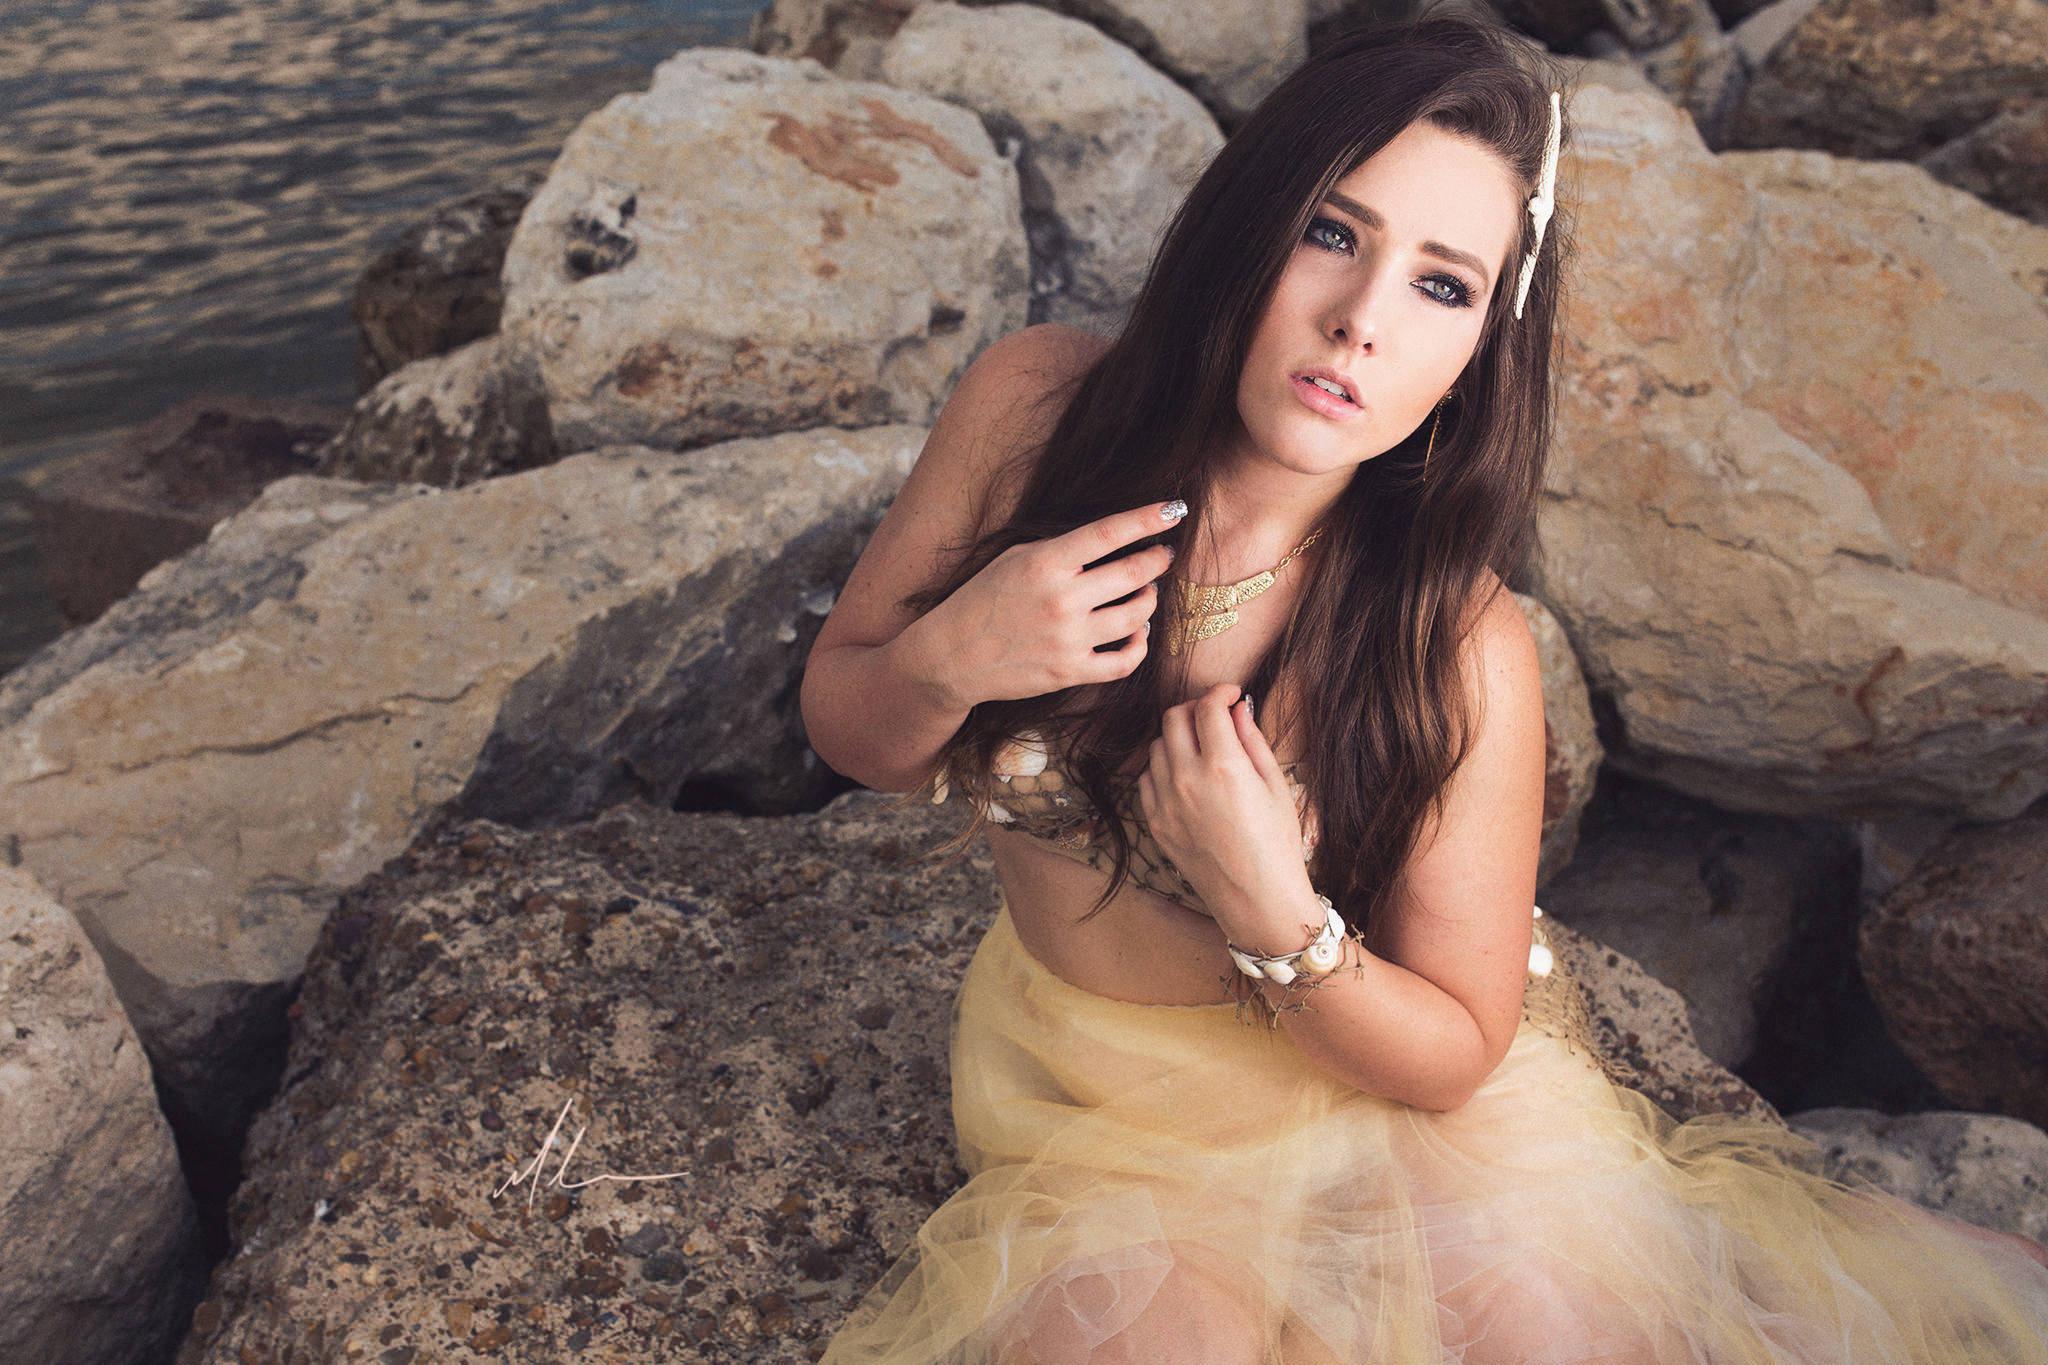 Abigail_MermaidV2_MichaelMoonPhotography-5202.jpg